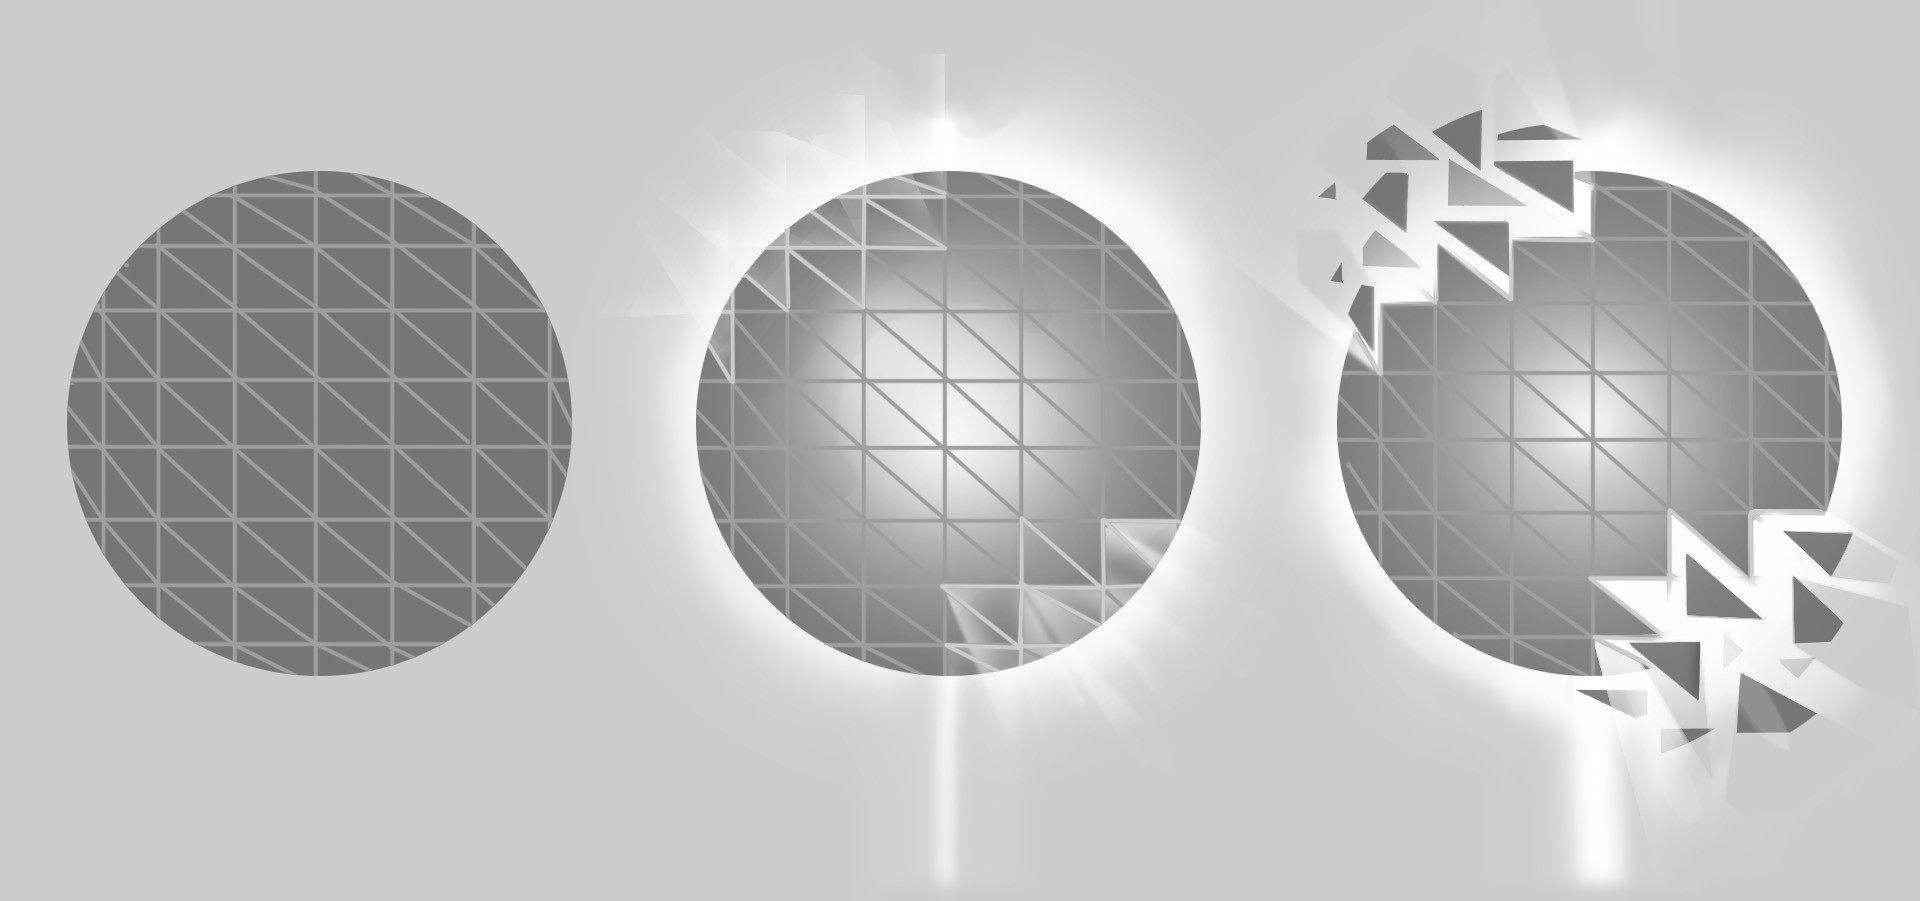 Giovanni sala sphere def01